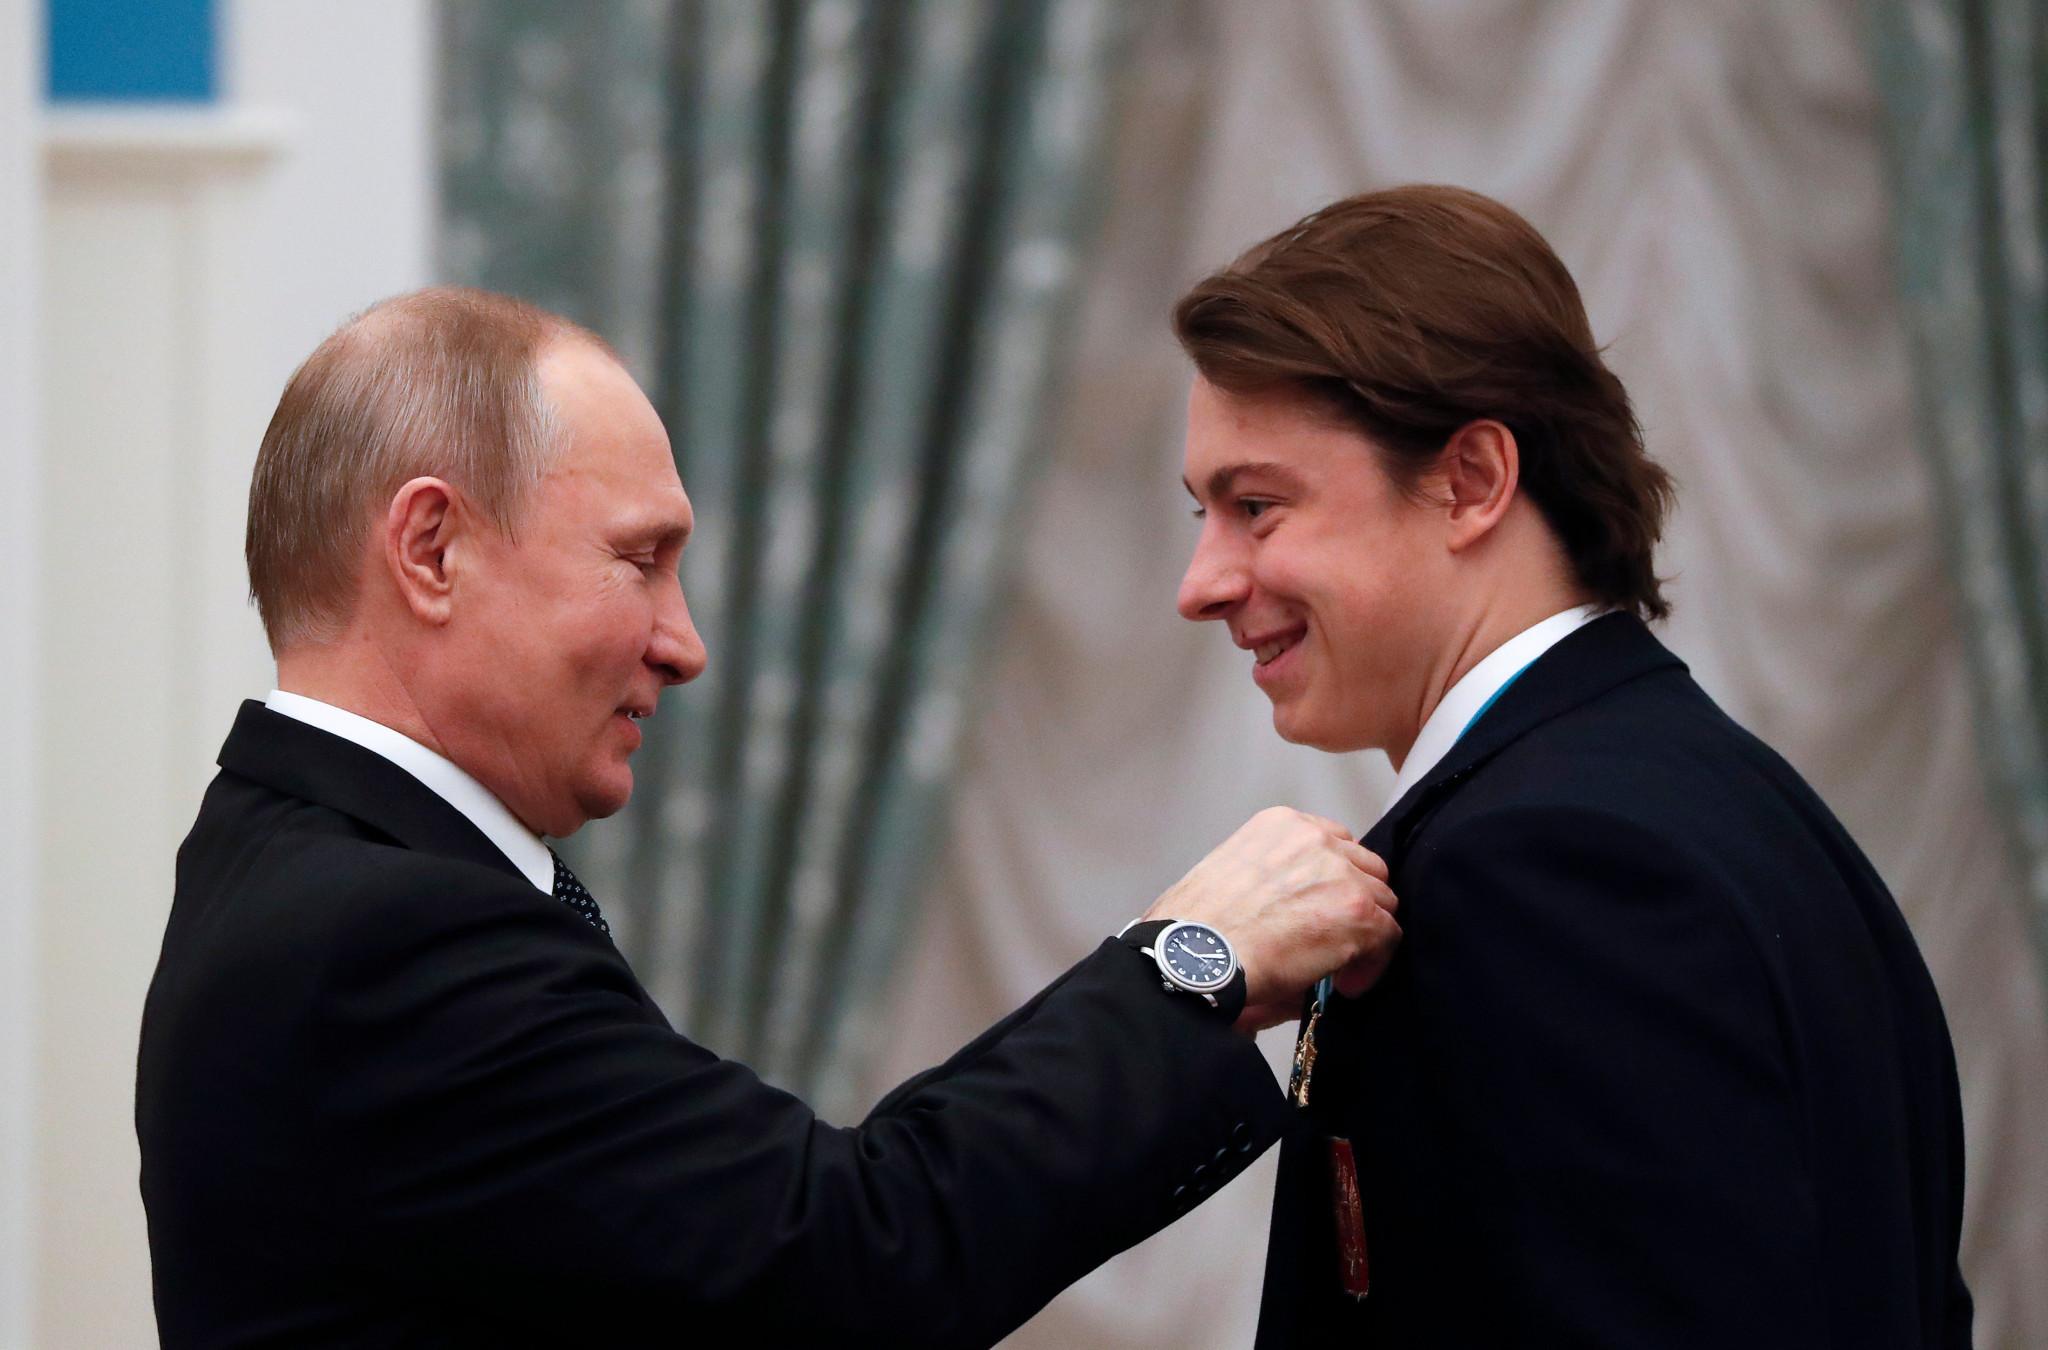 Putin thanks ice hockey players for singing Russian national anthem following Pyeongchang 2018 gold